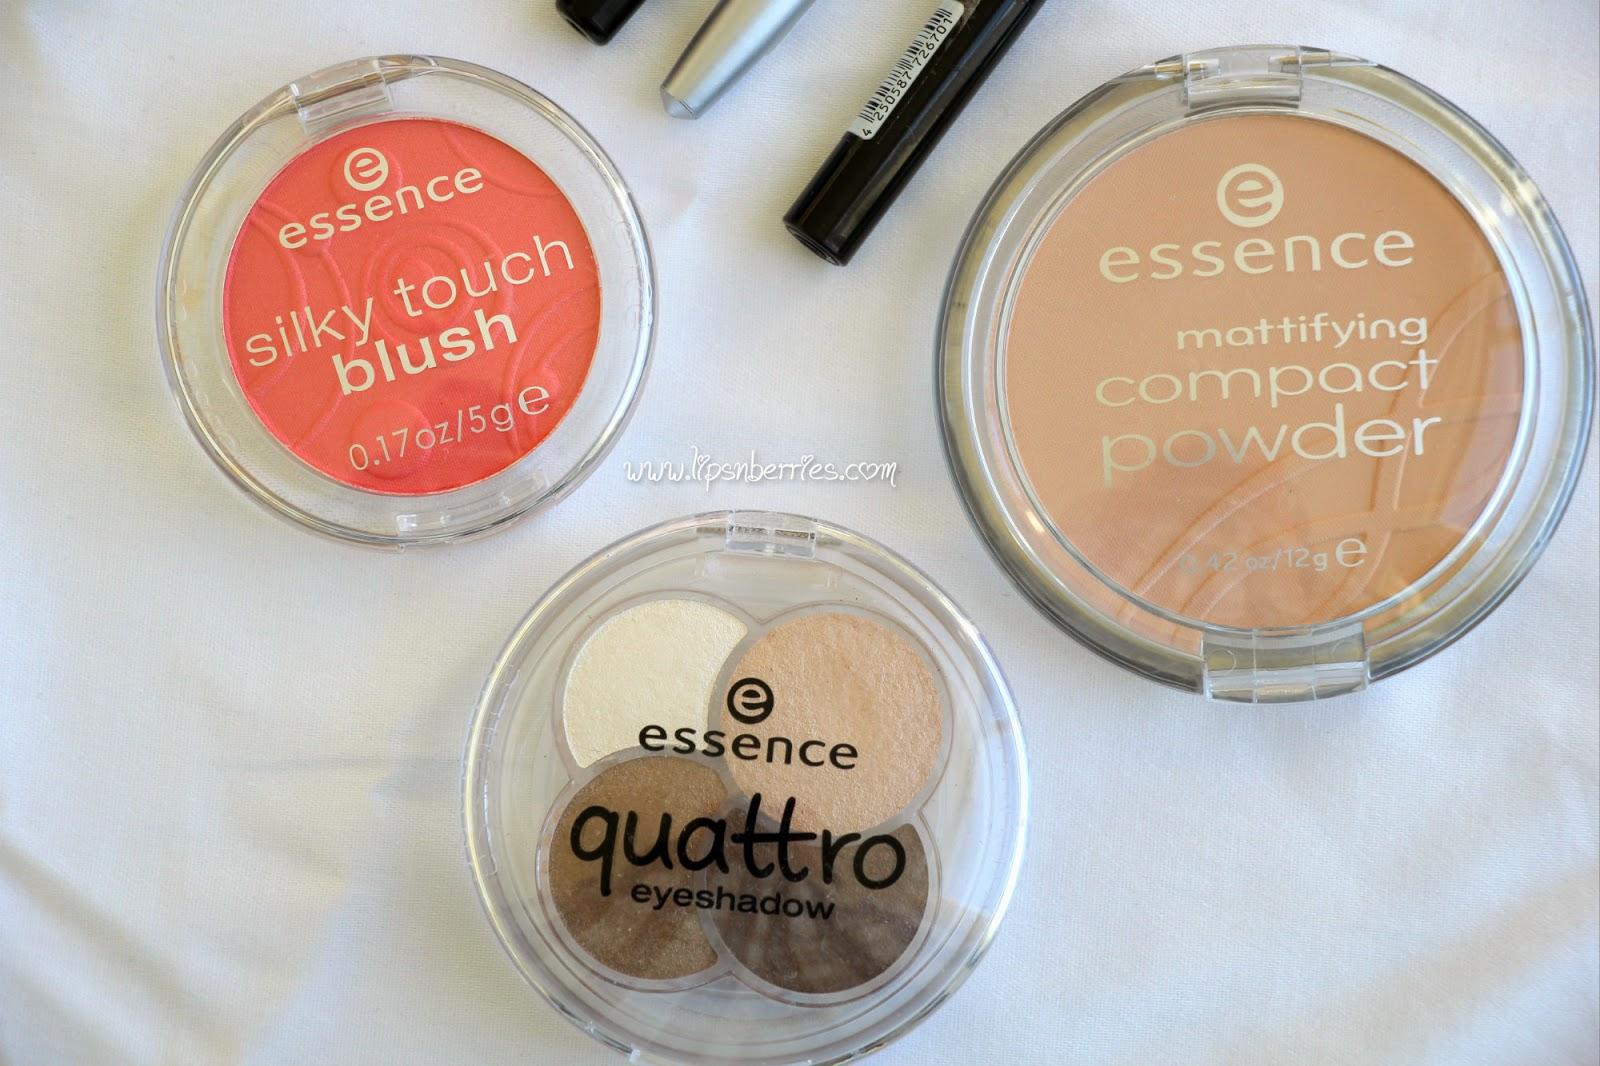 is Essence cosmetics cruelty free